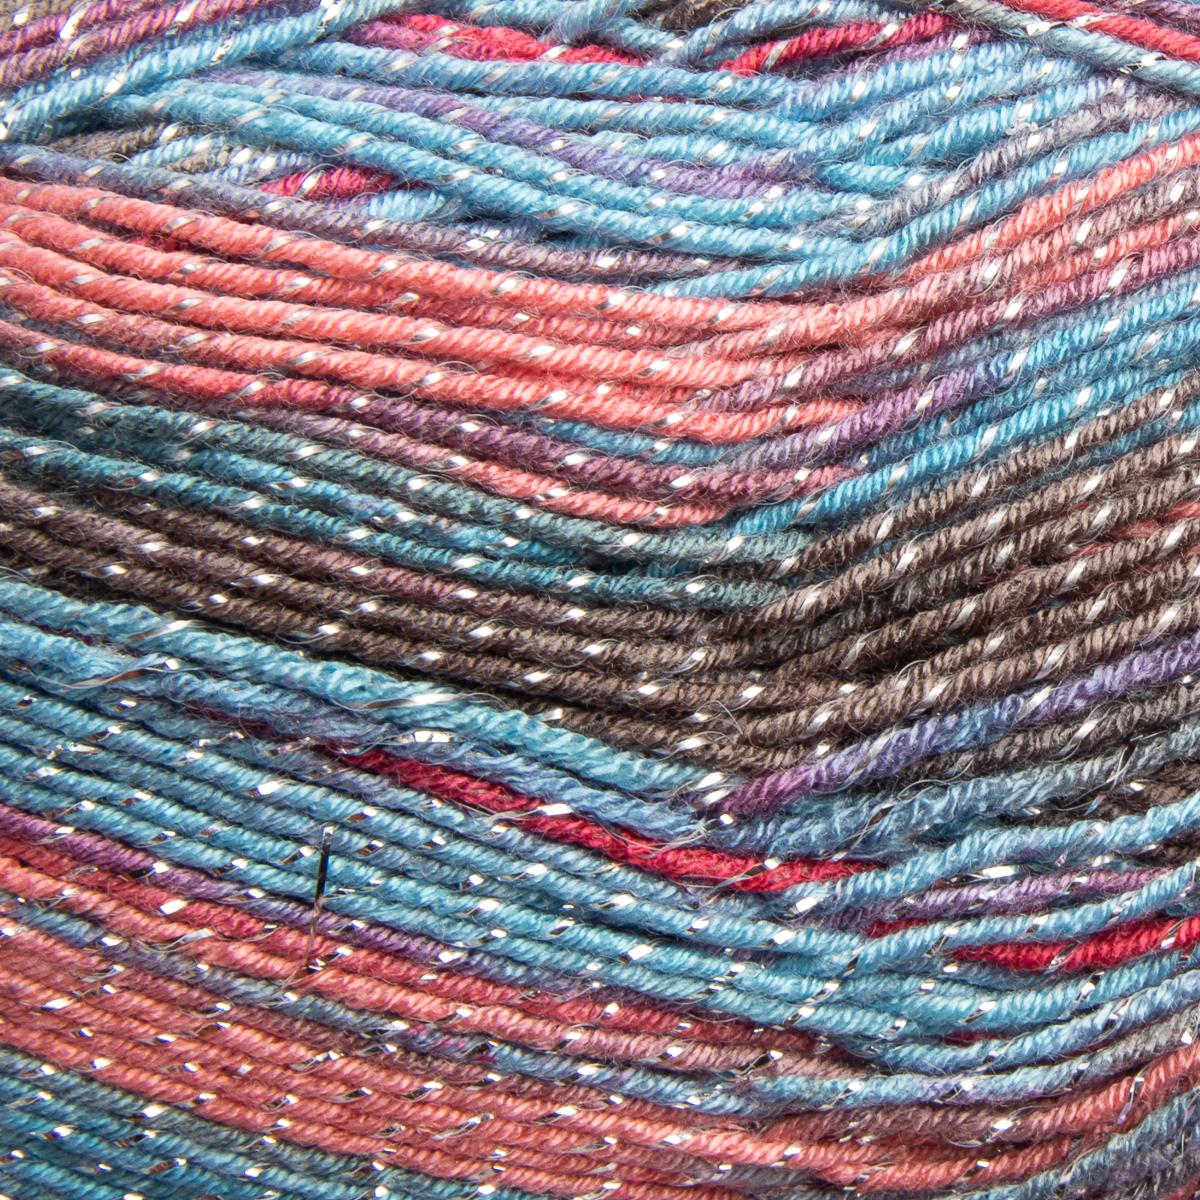 3pk-Premier-Yarns-Wool-Free-Lace-Acrylic-Yarn-Super-Fine-1-Knitting-Skeins-Soft thumbnail 22